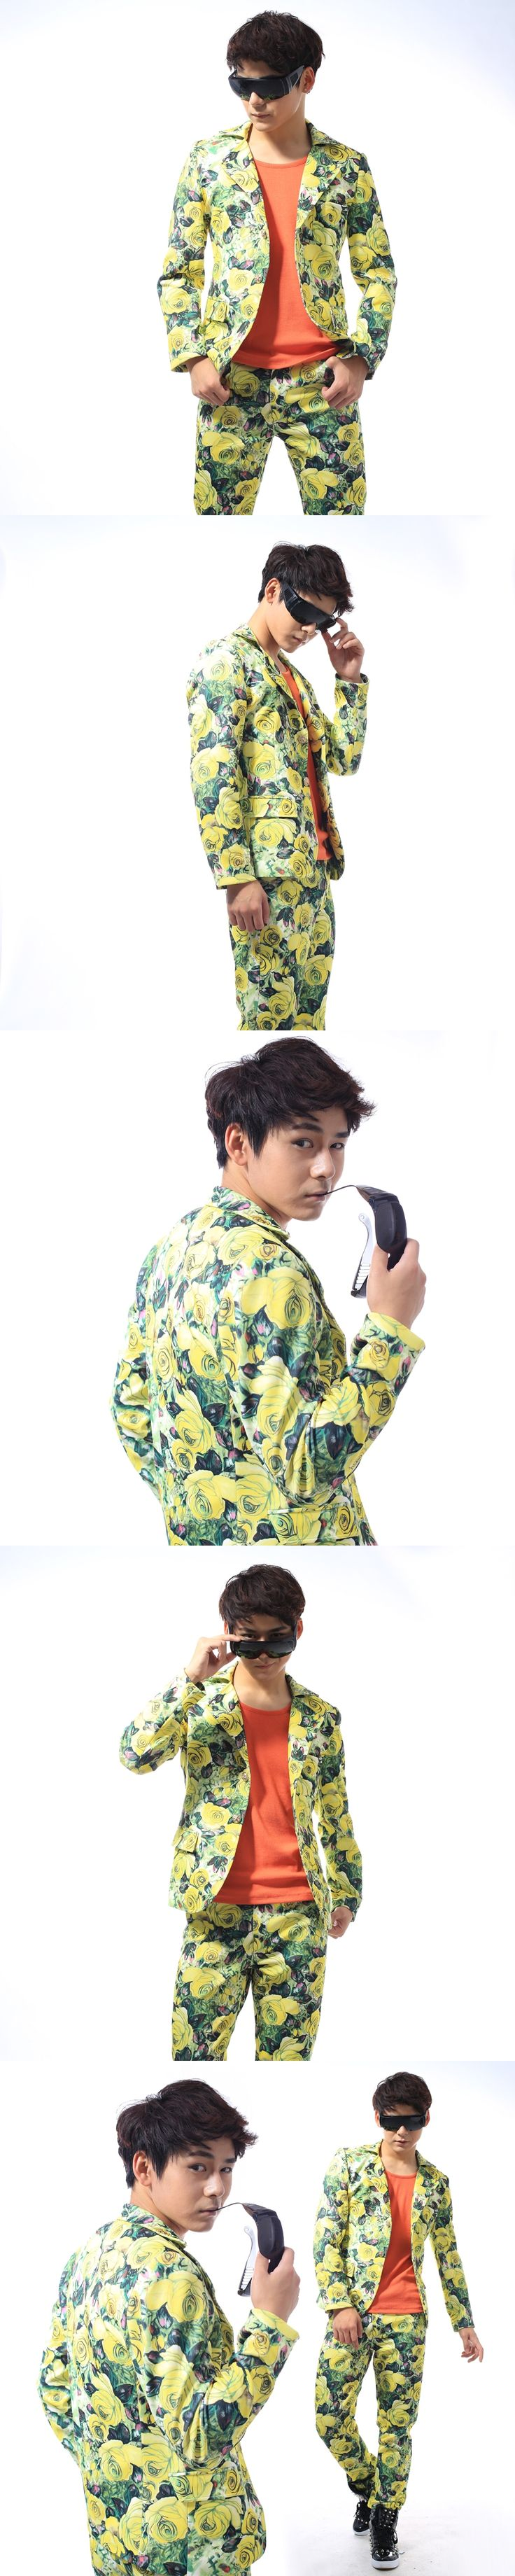 S-5XL!!!  2017   Printed men suit men's clothing Club broken beautiful suit men's cultiv  The singer's clothing